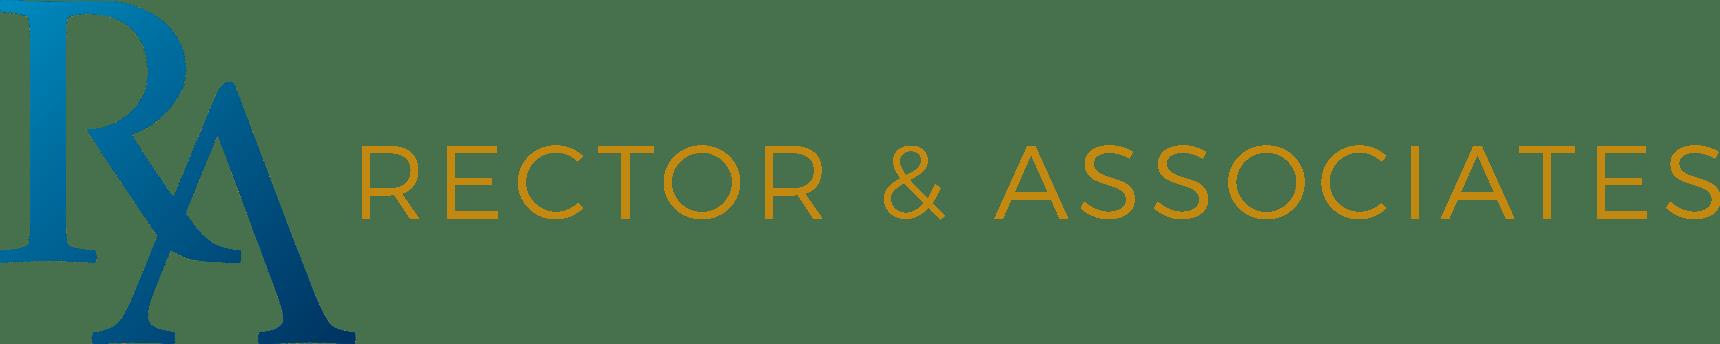 Rector & Associates